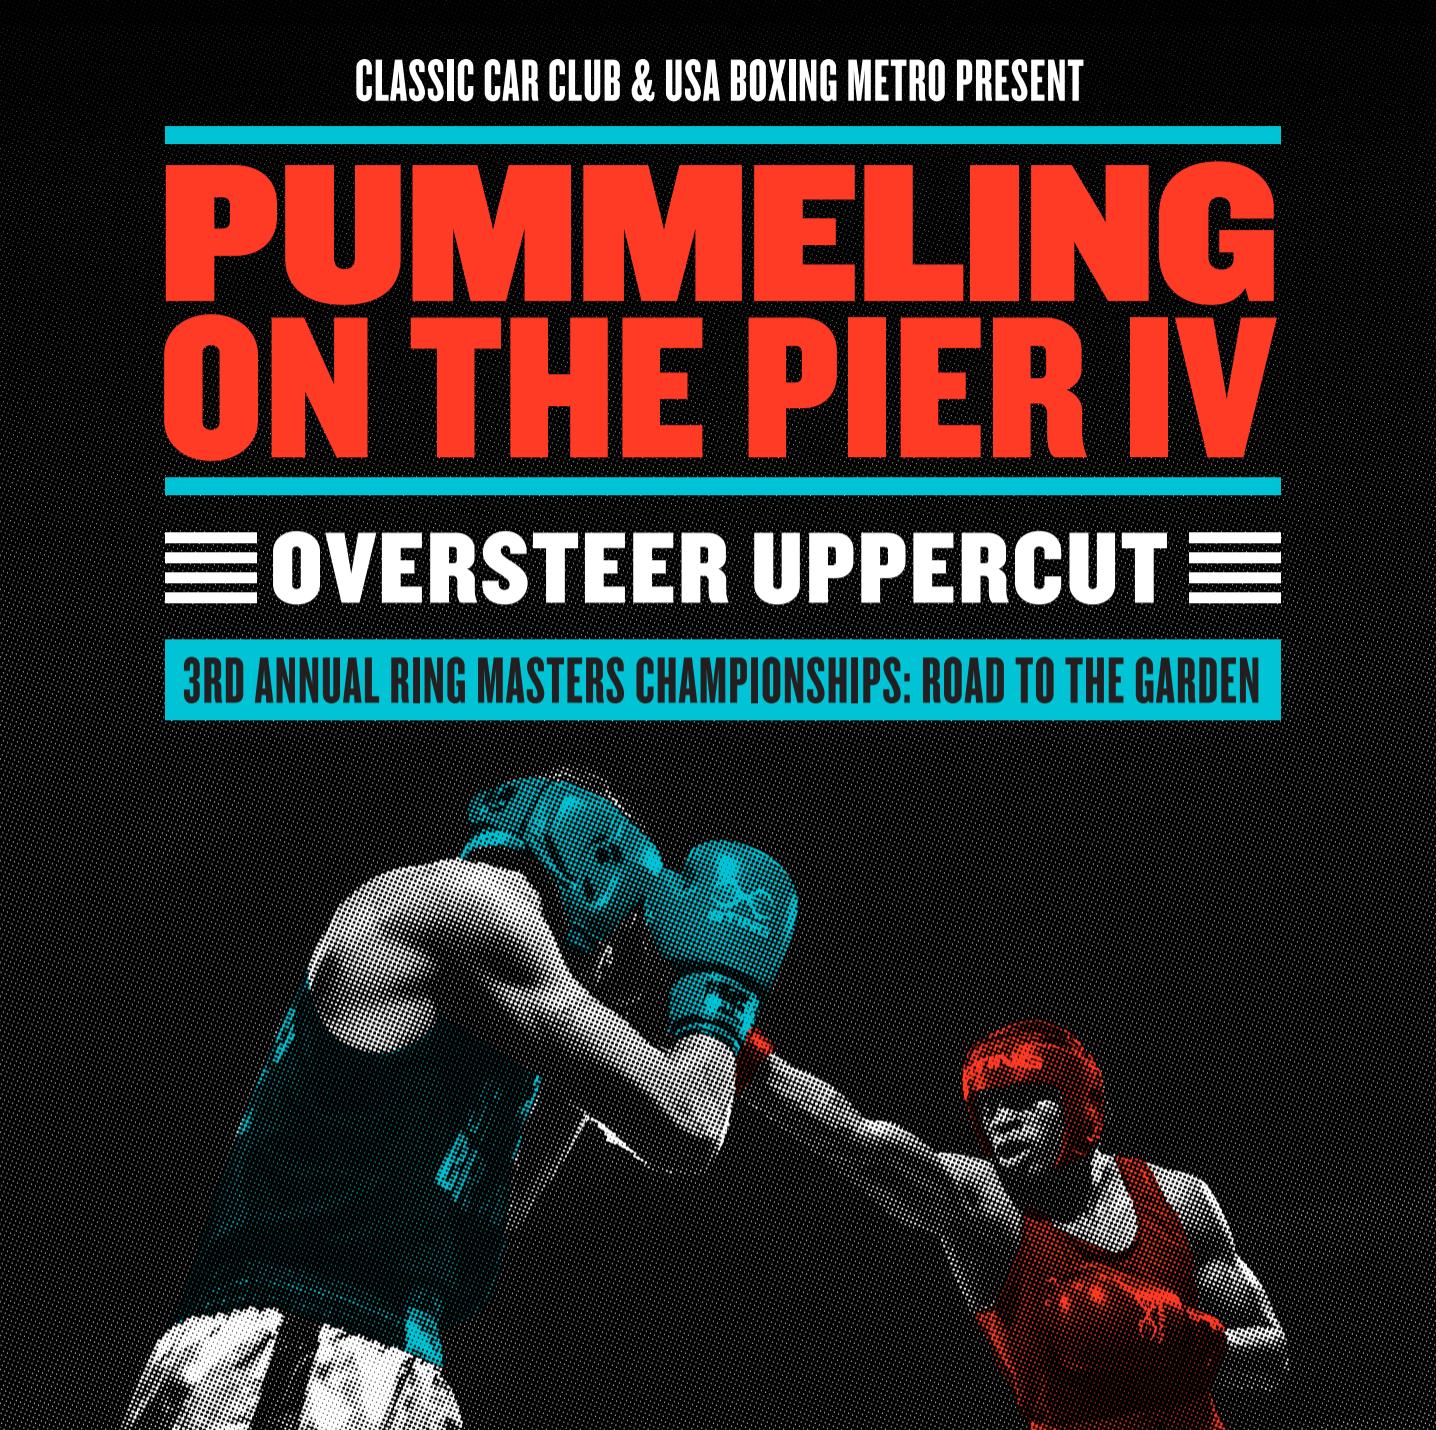 (Postponed) CCC FIGHT NIGHT IV